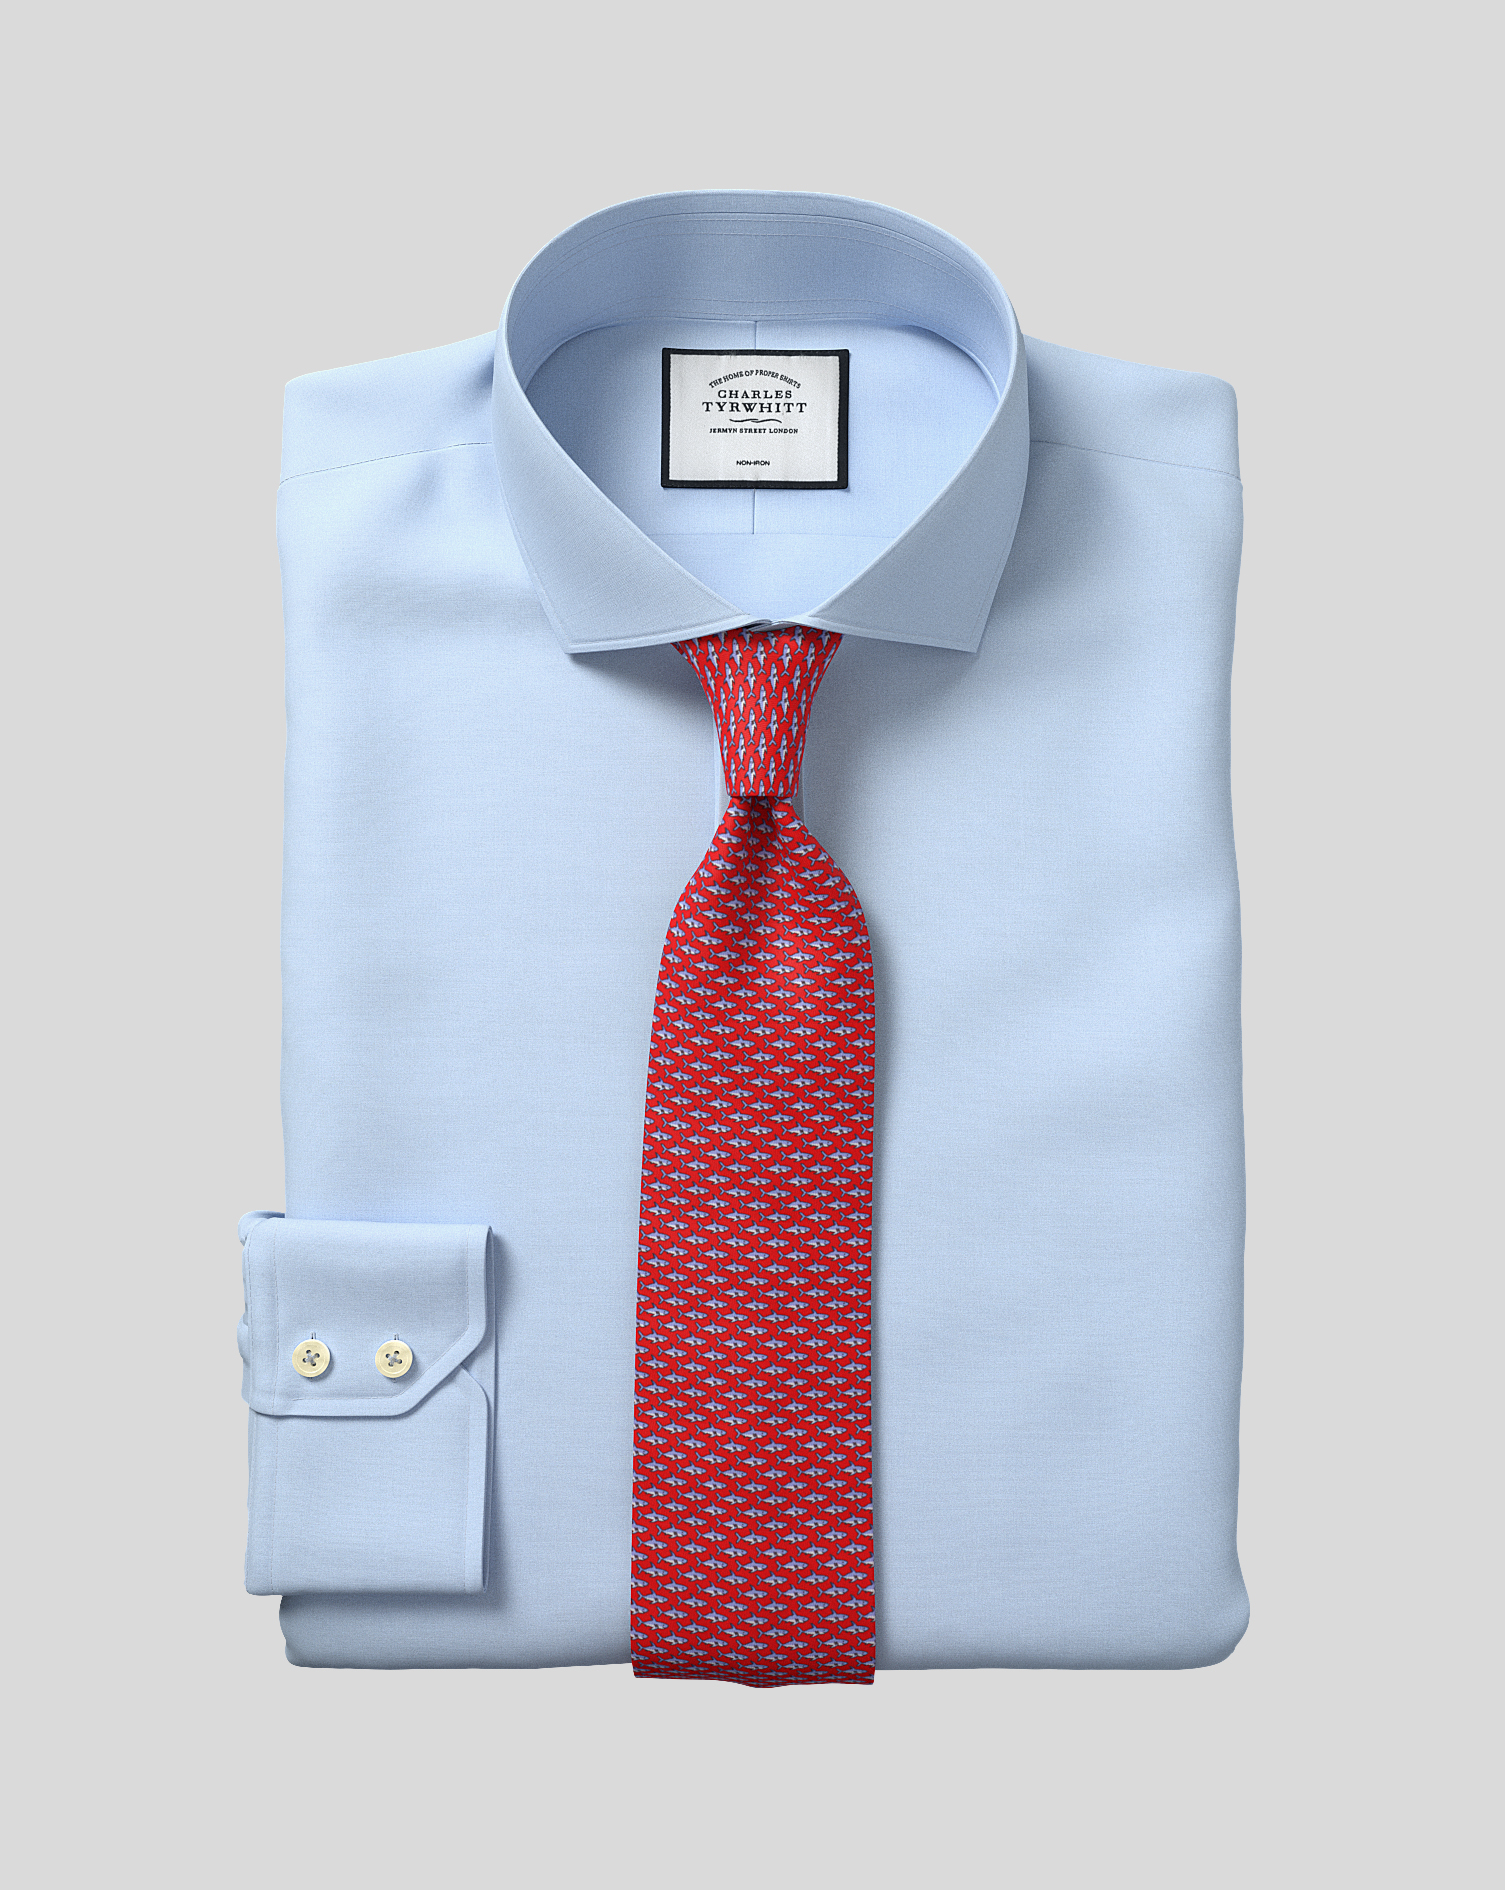 Slim Fit Non-Iron Cutaway Sky Blue Tyrwhitt Cool Cotton Formal Shirt Single Cuff Size 16/32 by Charl